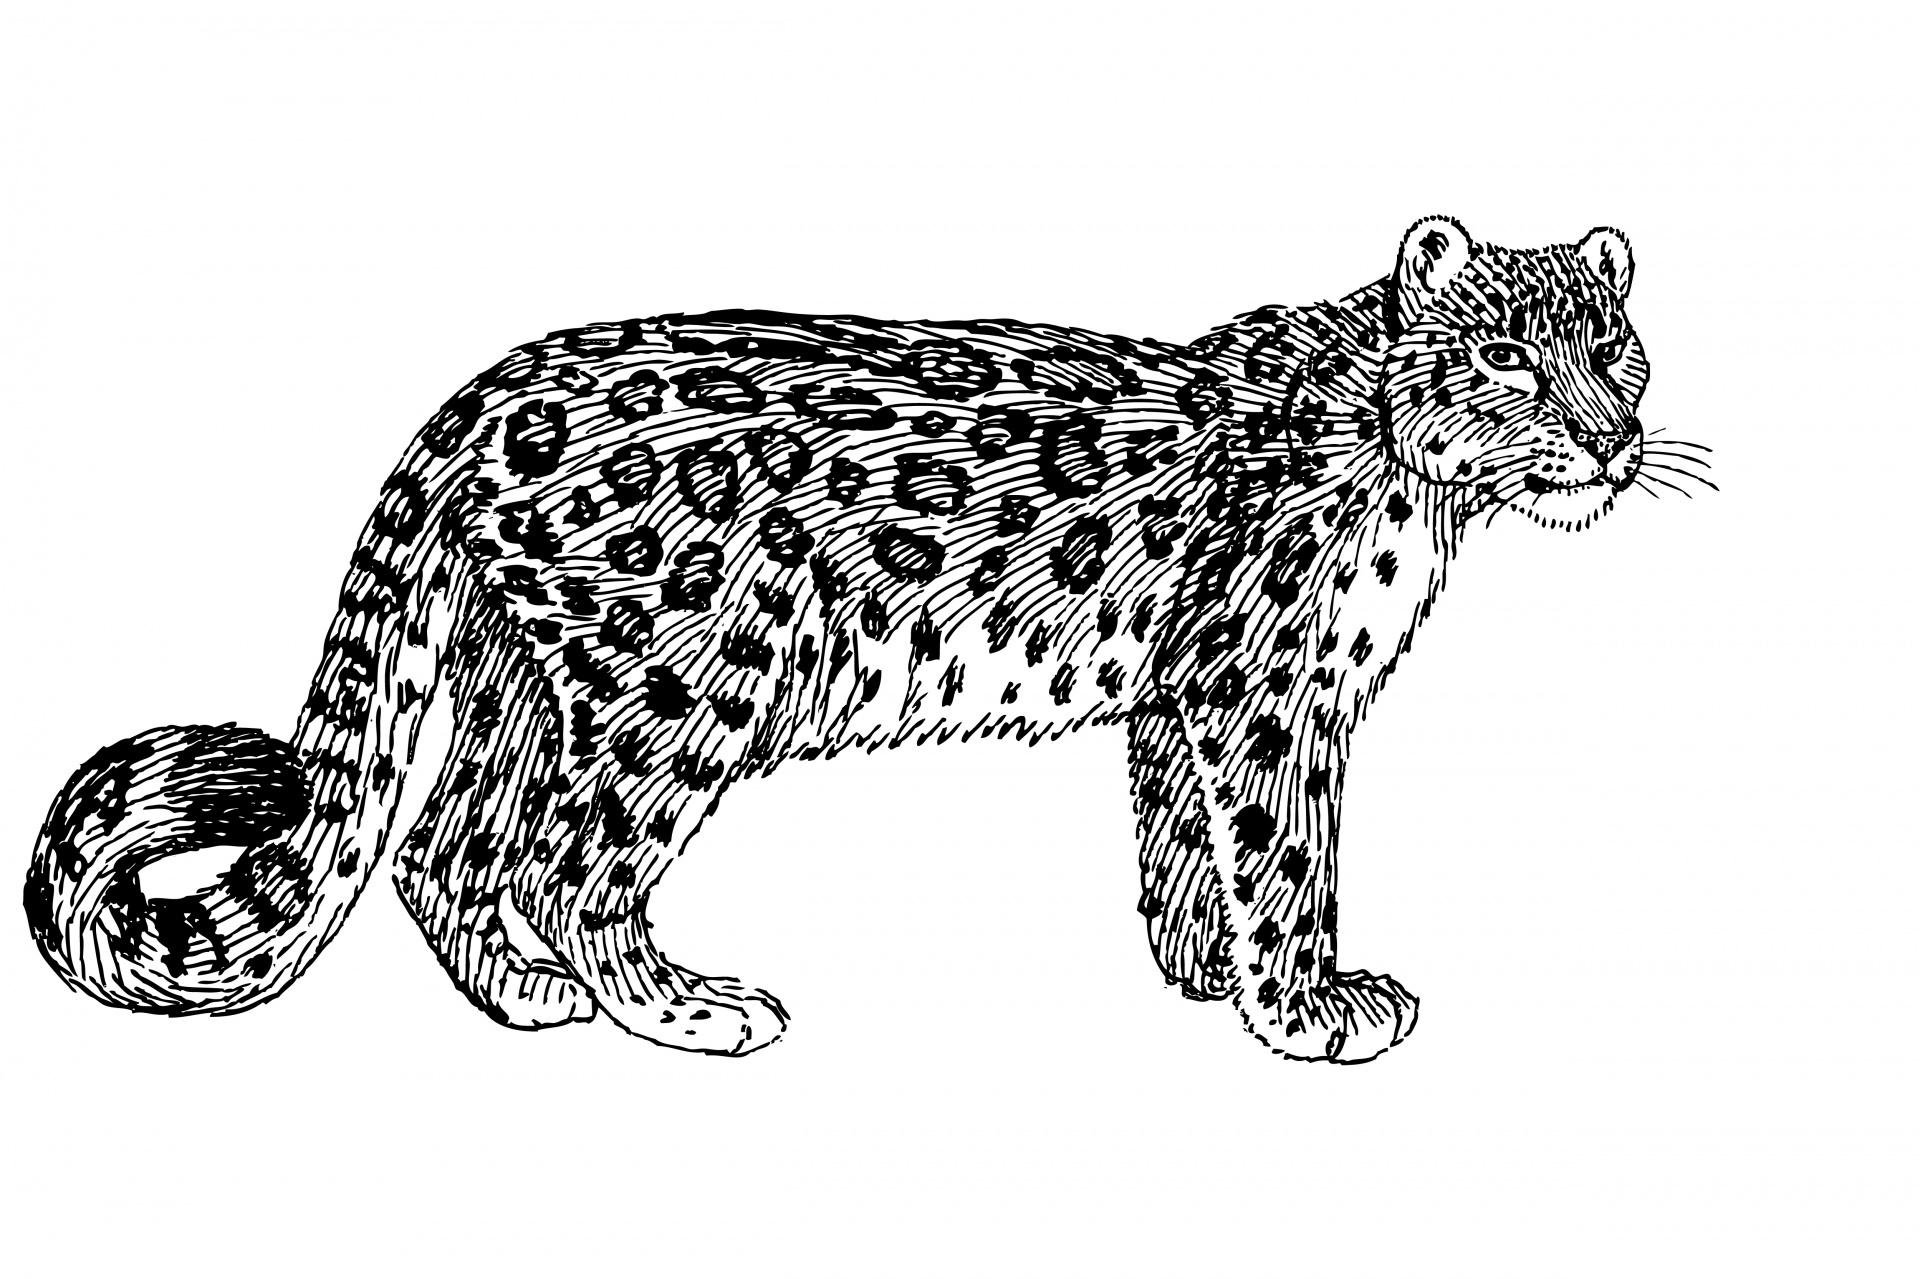 Snow Leopard Illustration Clipart Free Stock Photo